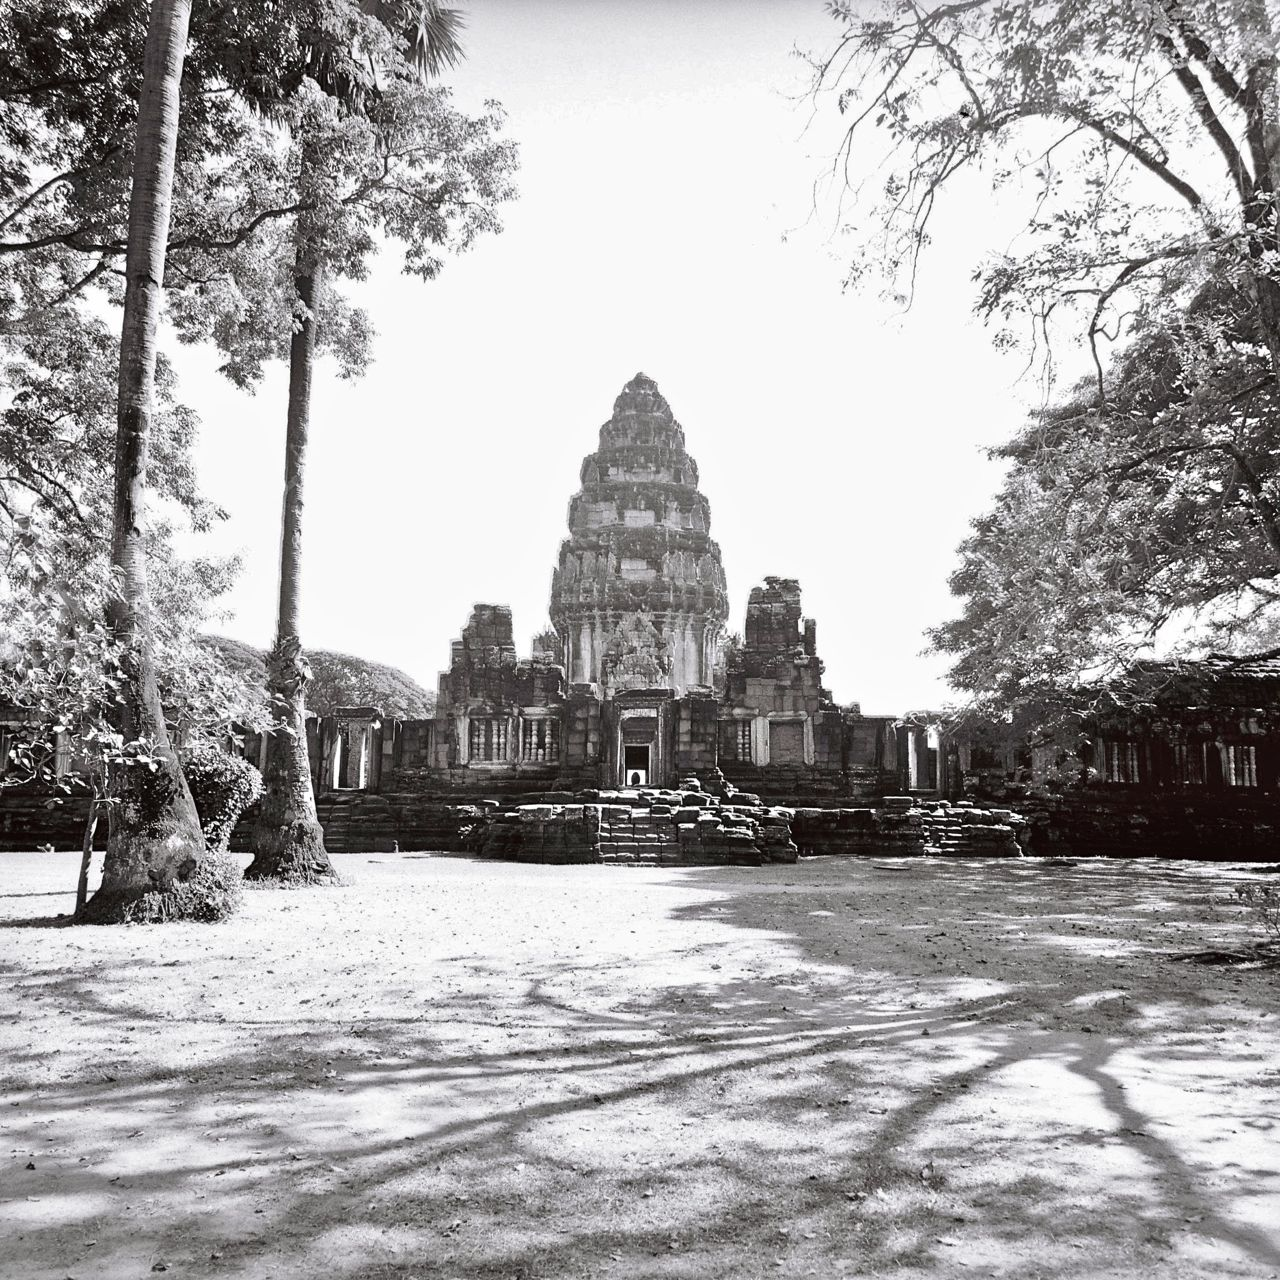 Prasat Hin Phimai 去年行ったピマーイ遺跡。